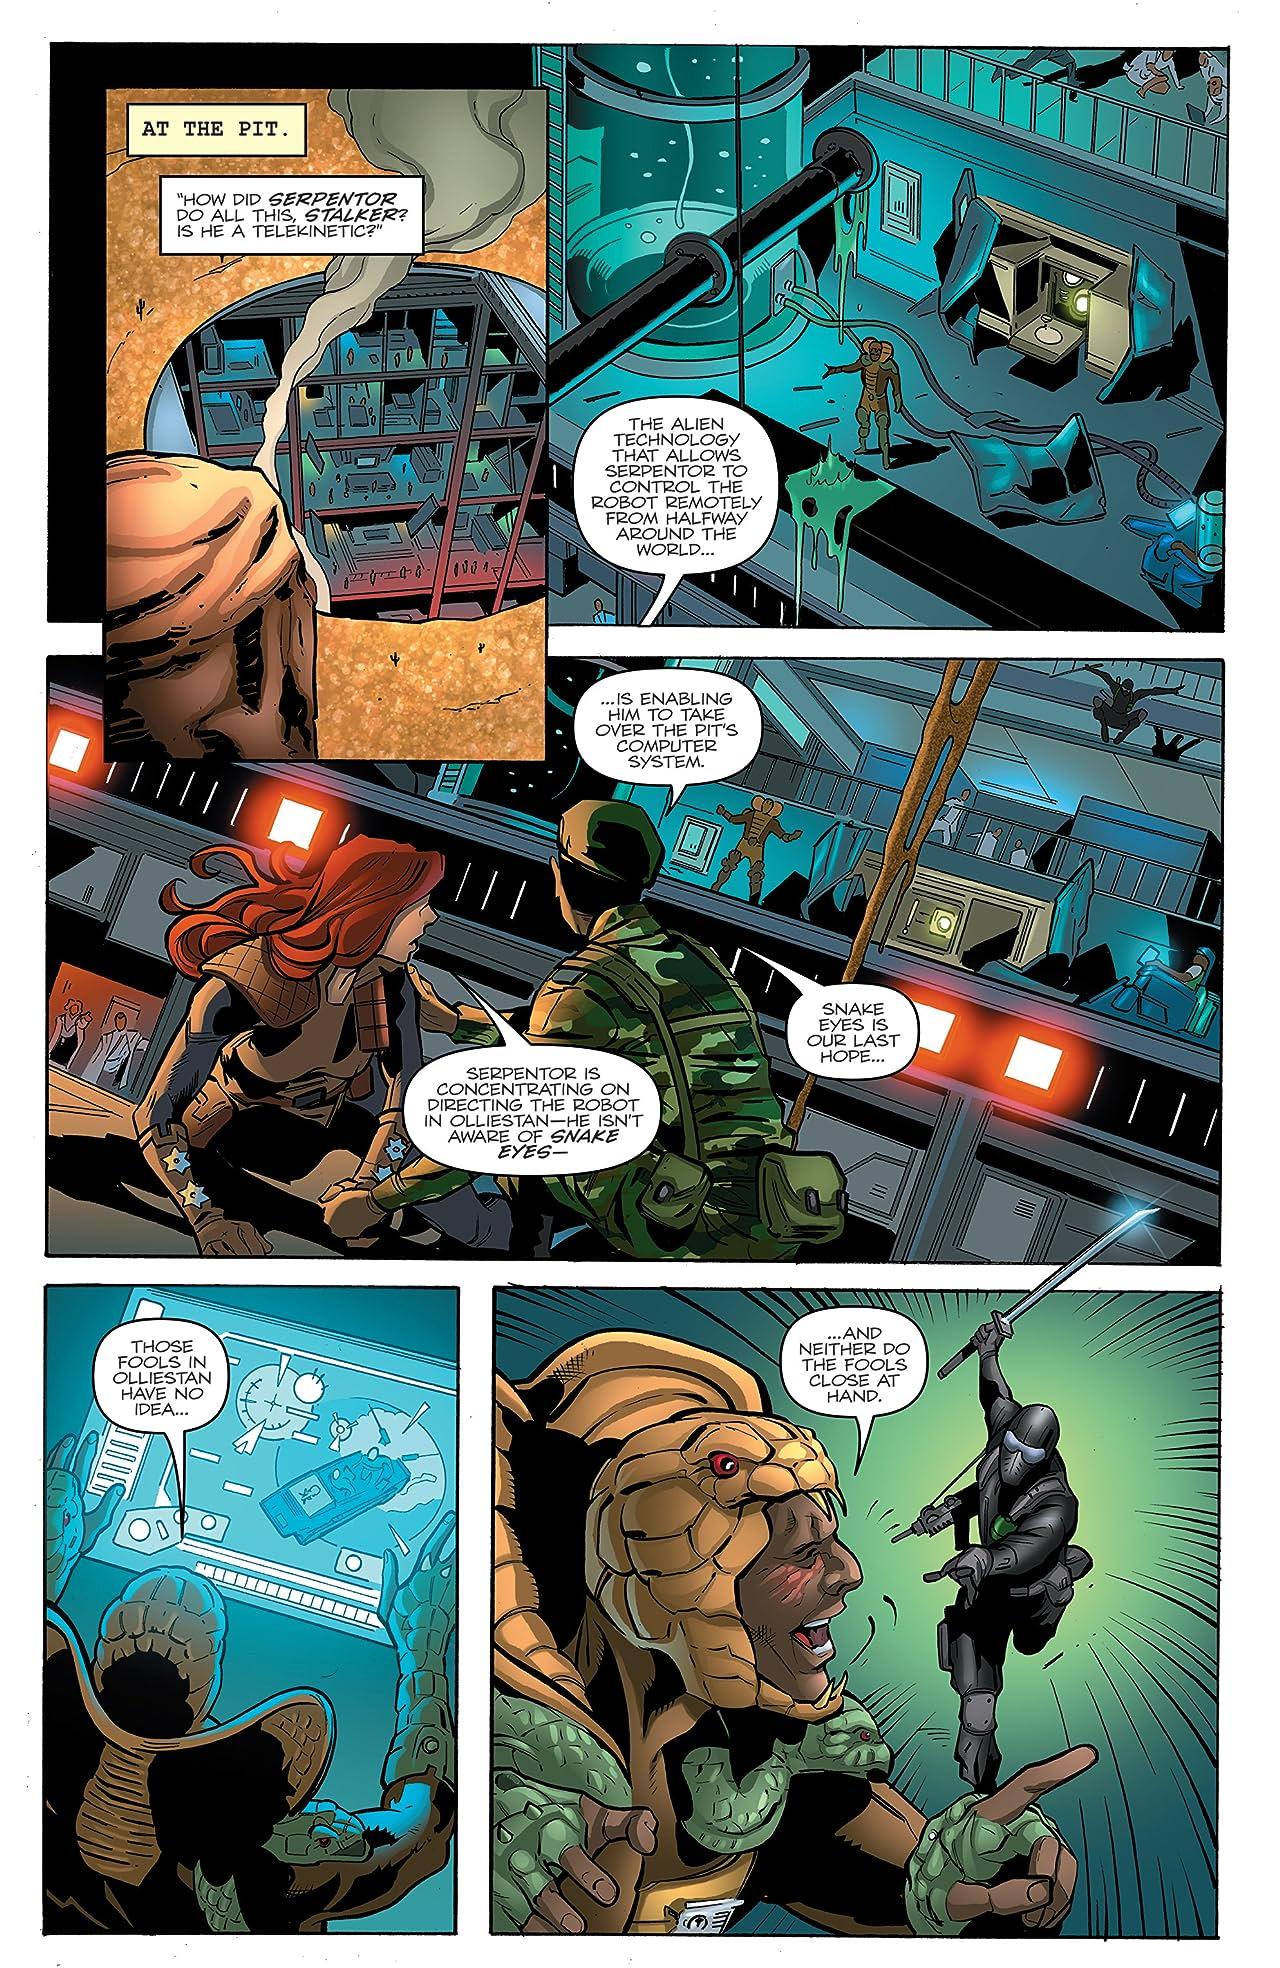 G.I. Joe: A Real American Hero #213: The Death of Snake Eyes: Part 2